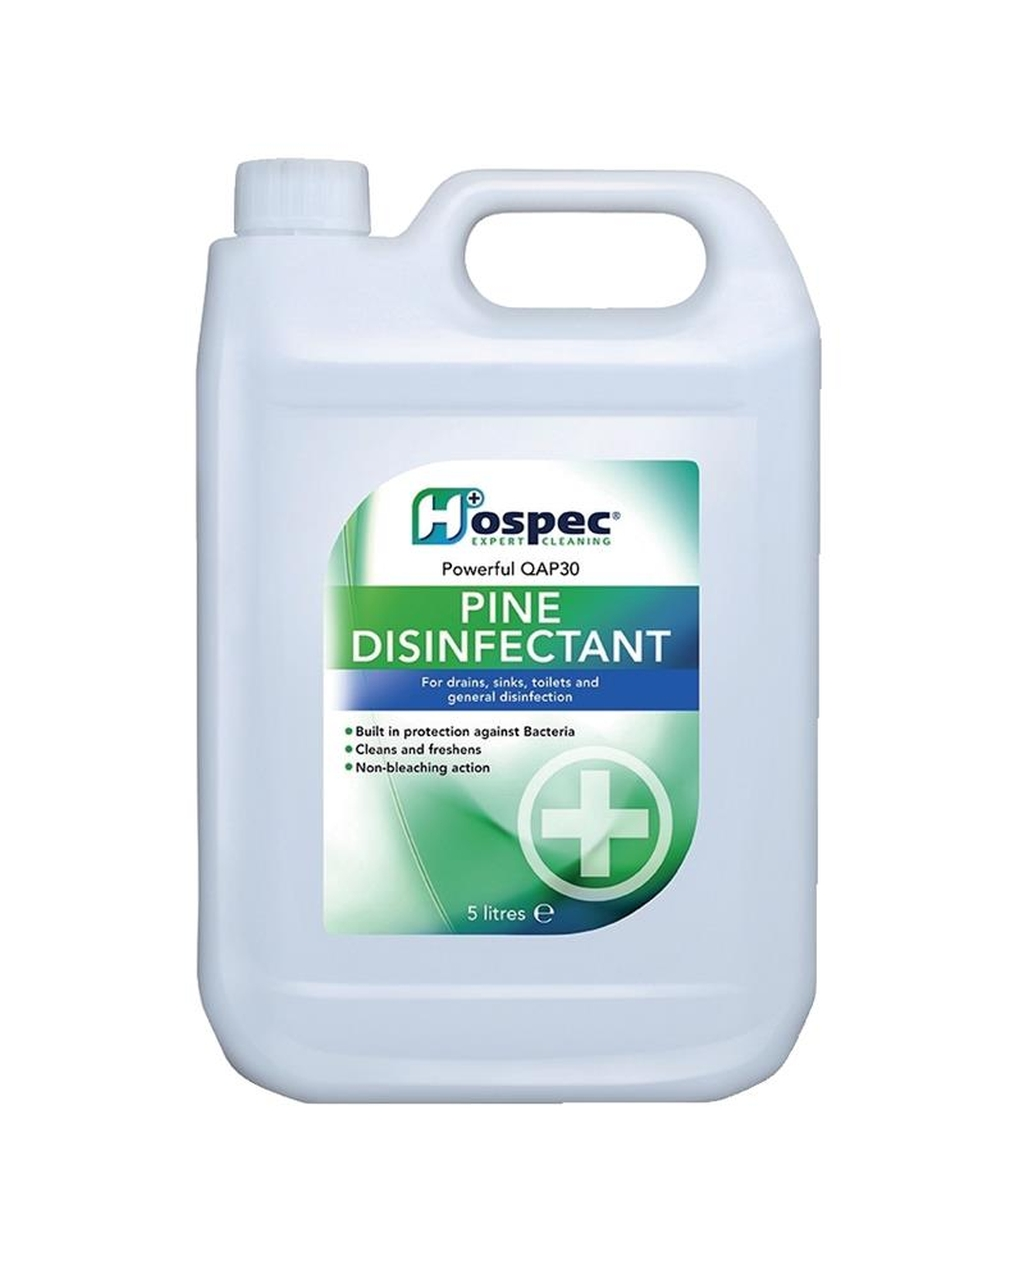 Hospec Pine Disinfectant QAP 30 - 5L